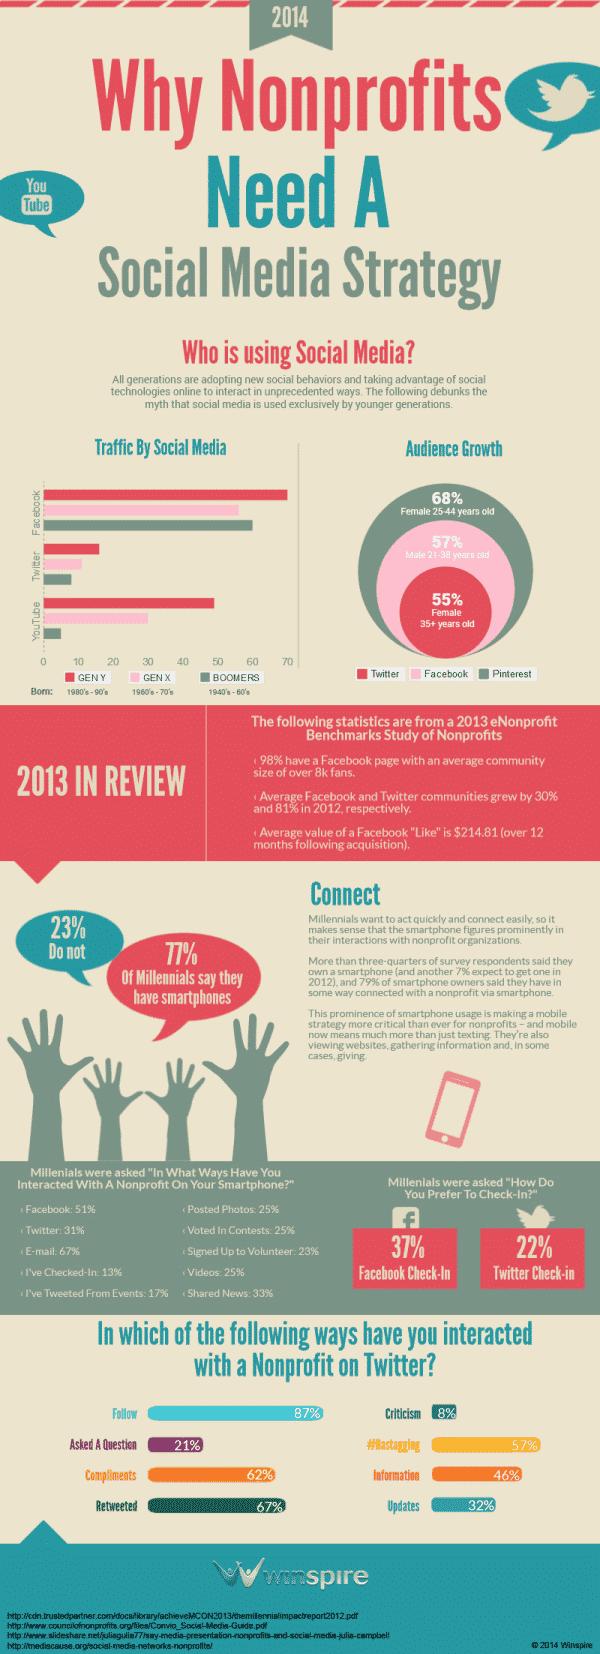 Why Nonprofits Need a Social Media Strategy #nonprofits #npo #infographic